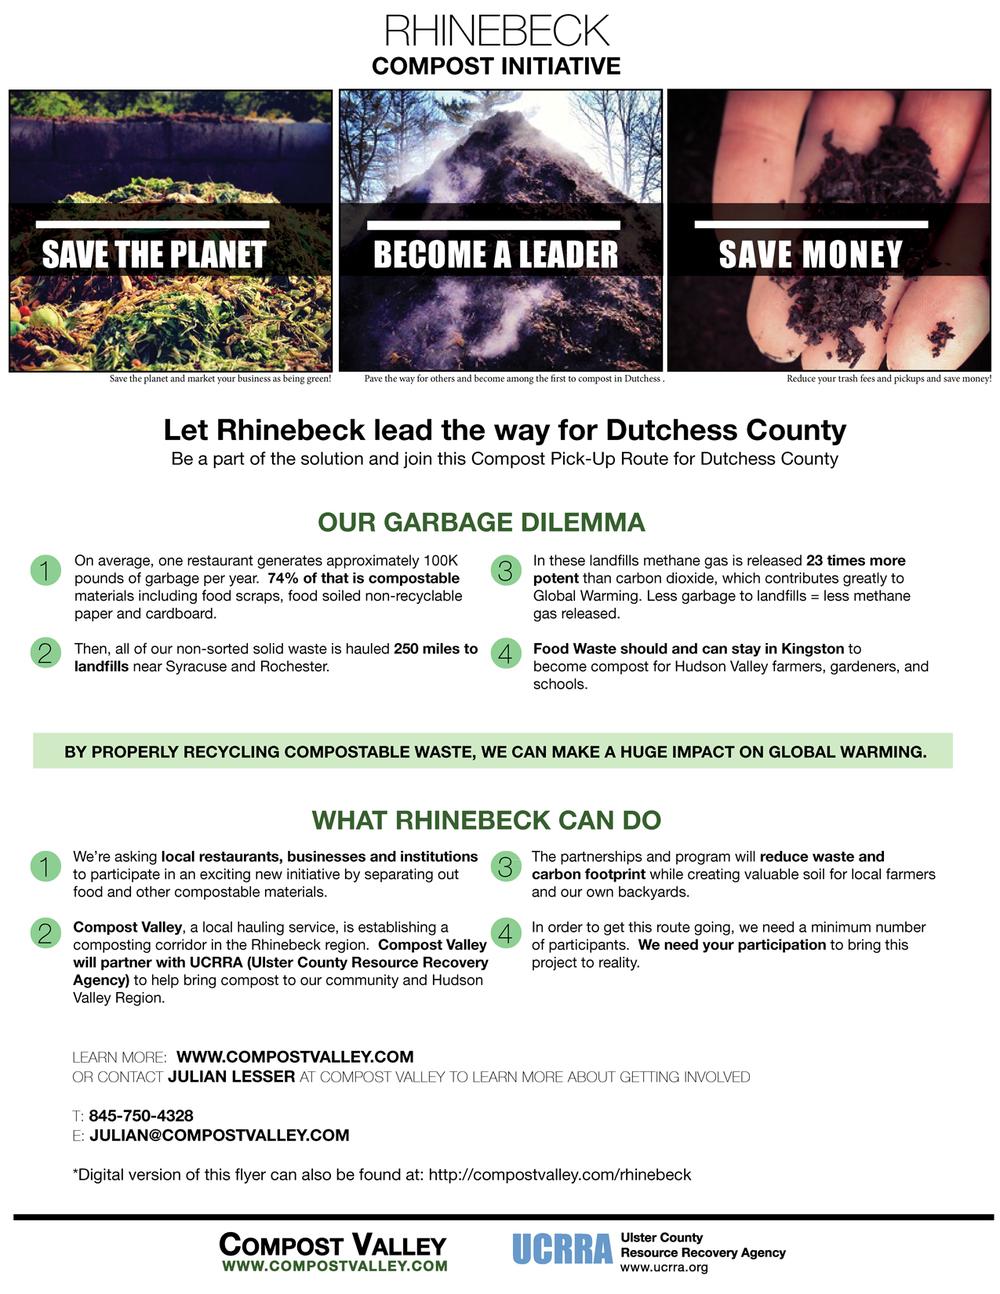 Rhinebeck-Compost-flyer.jpg